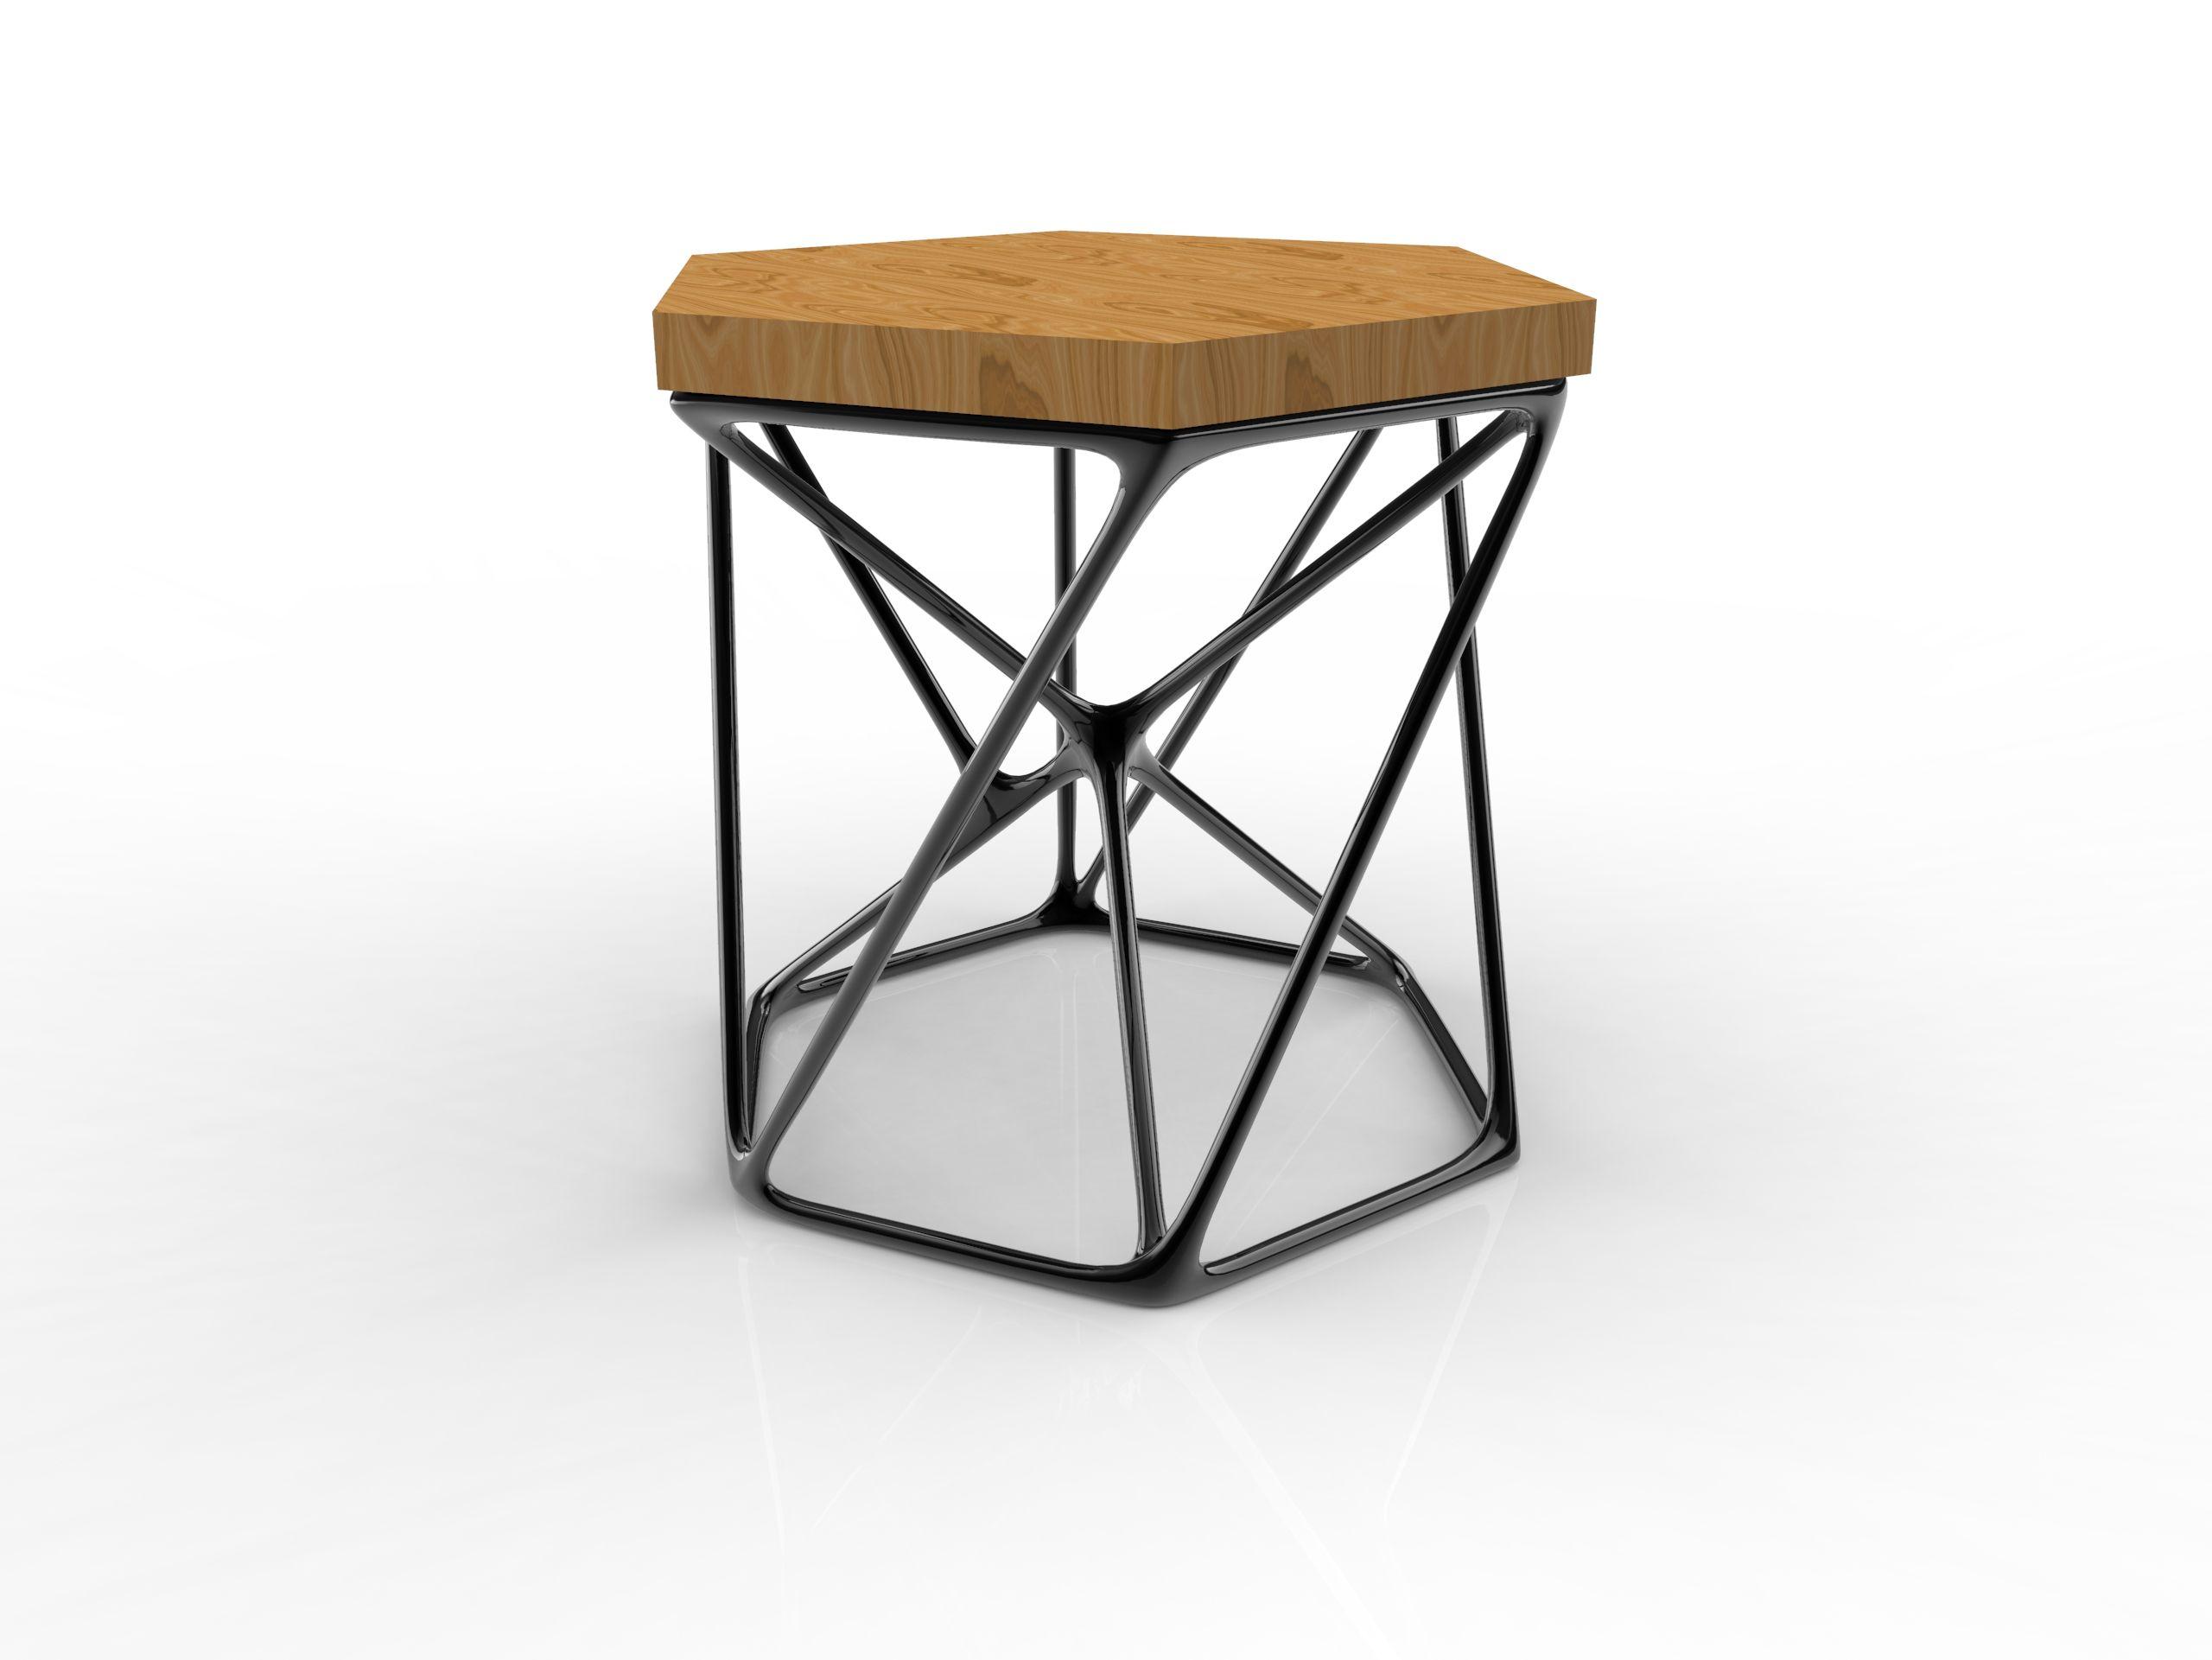 Fabrica-de-nerdes---design-ind-lcs19-makers-3500-3500